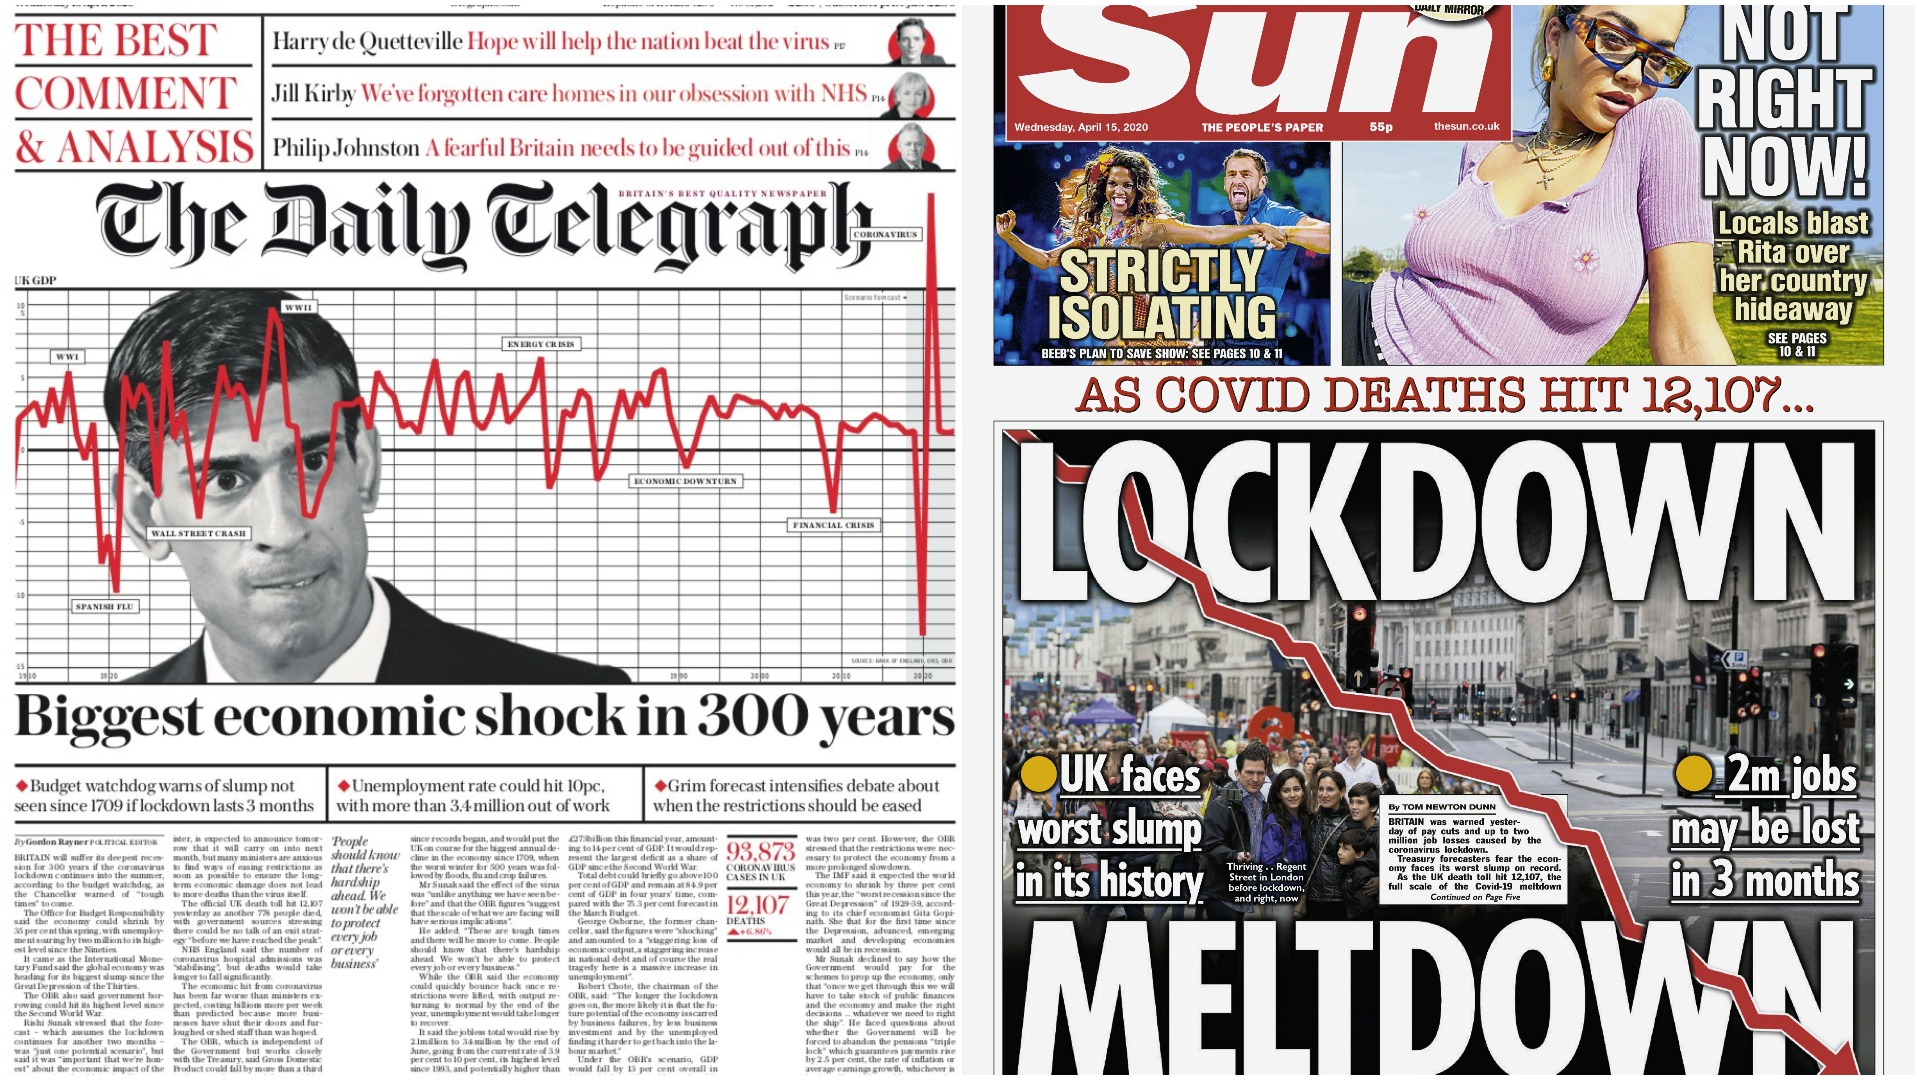 Lockdown Meltdown Coronavirus Economy Impact Leads Papers Itv News